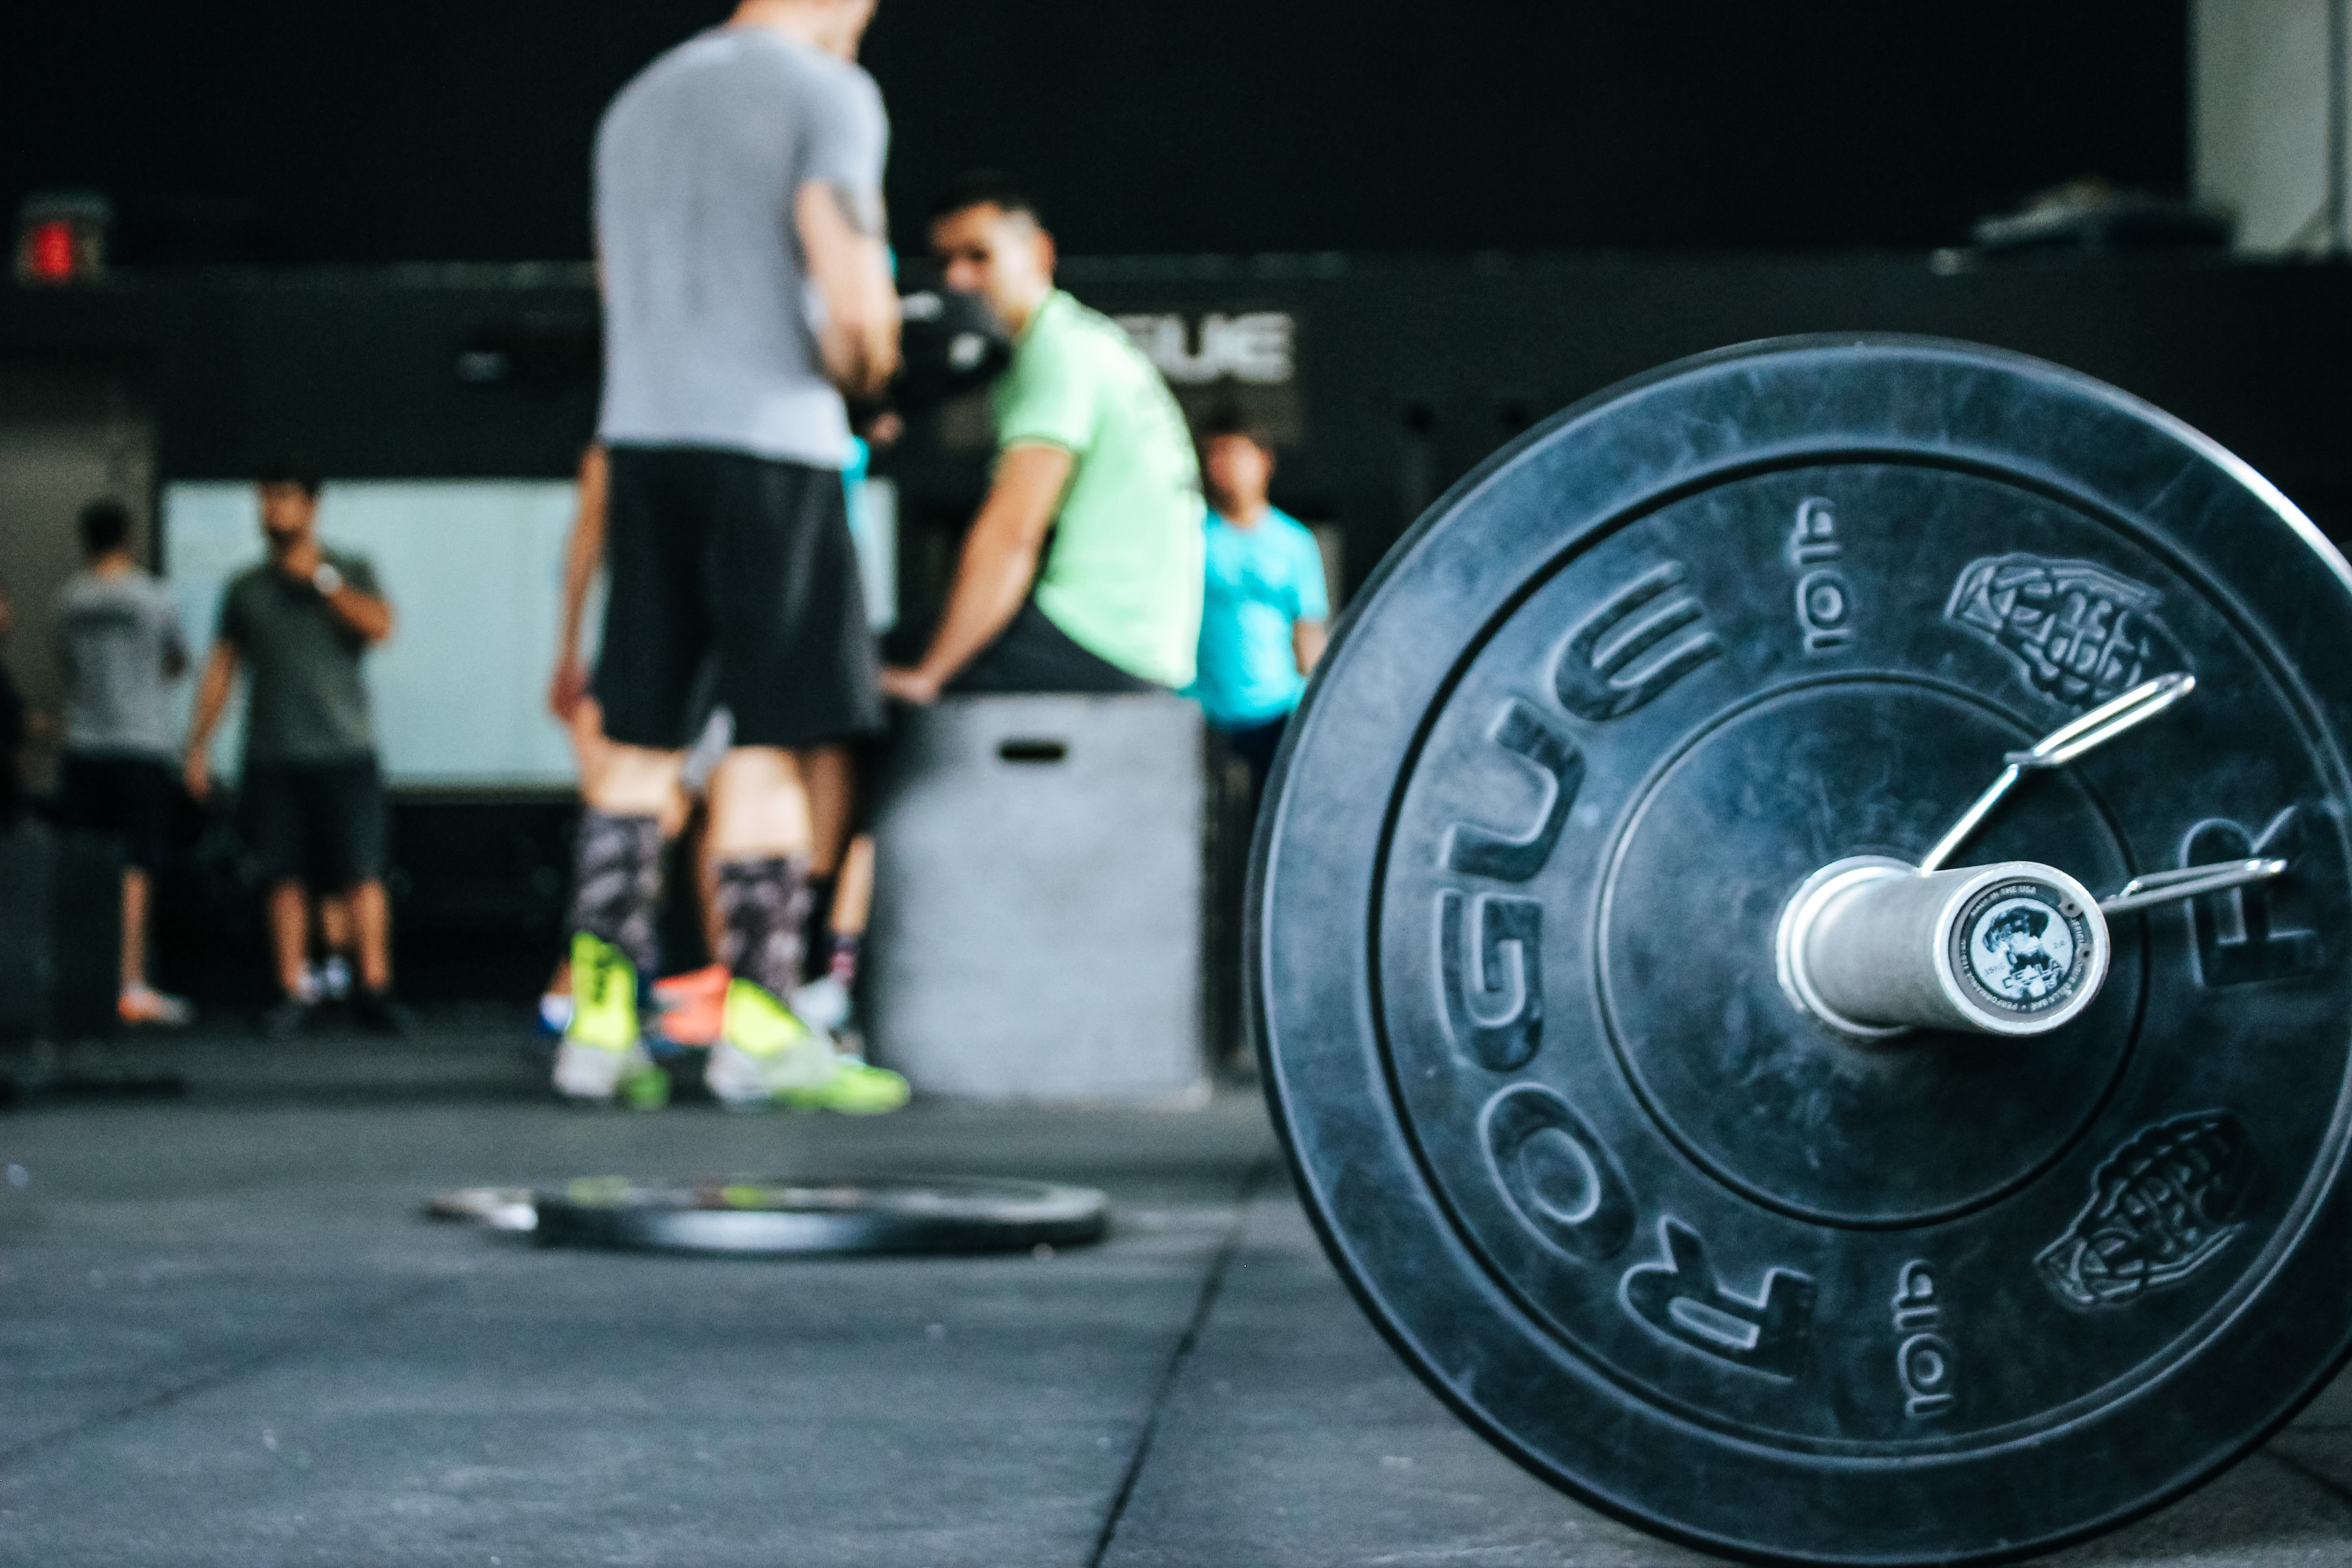 Lift weight lift Life